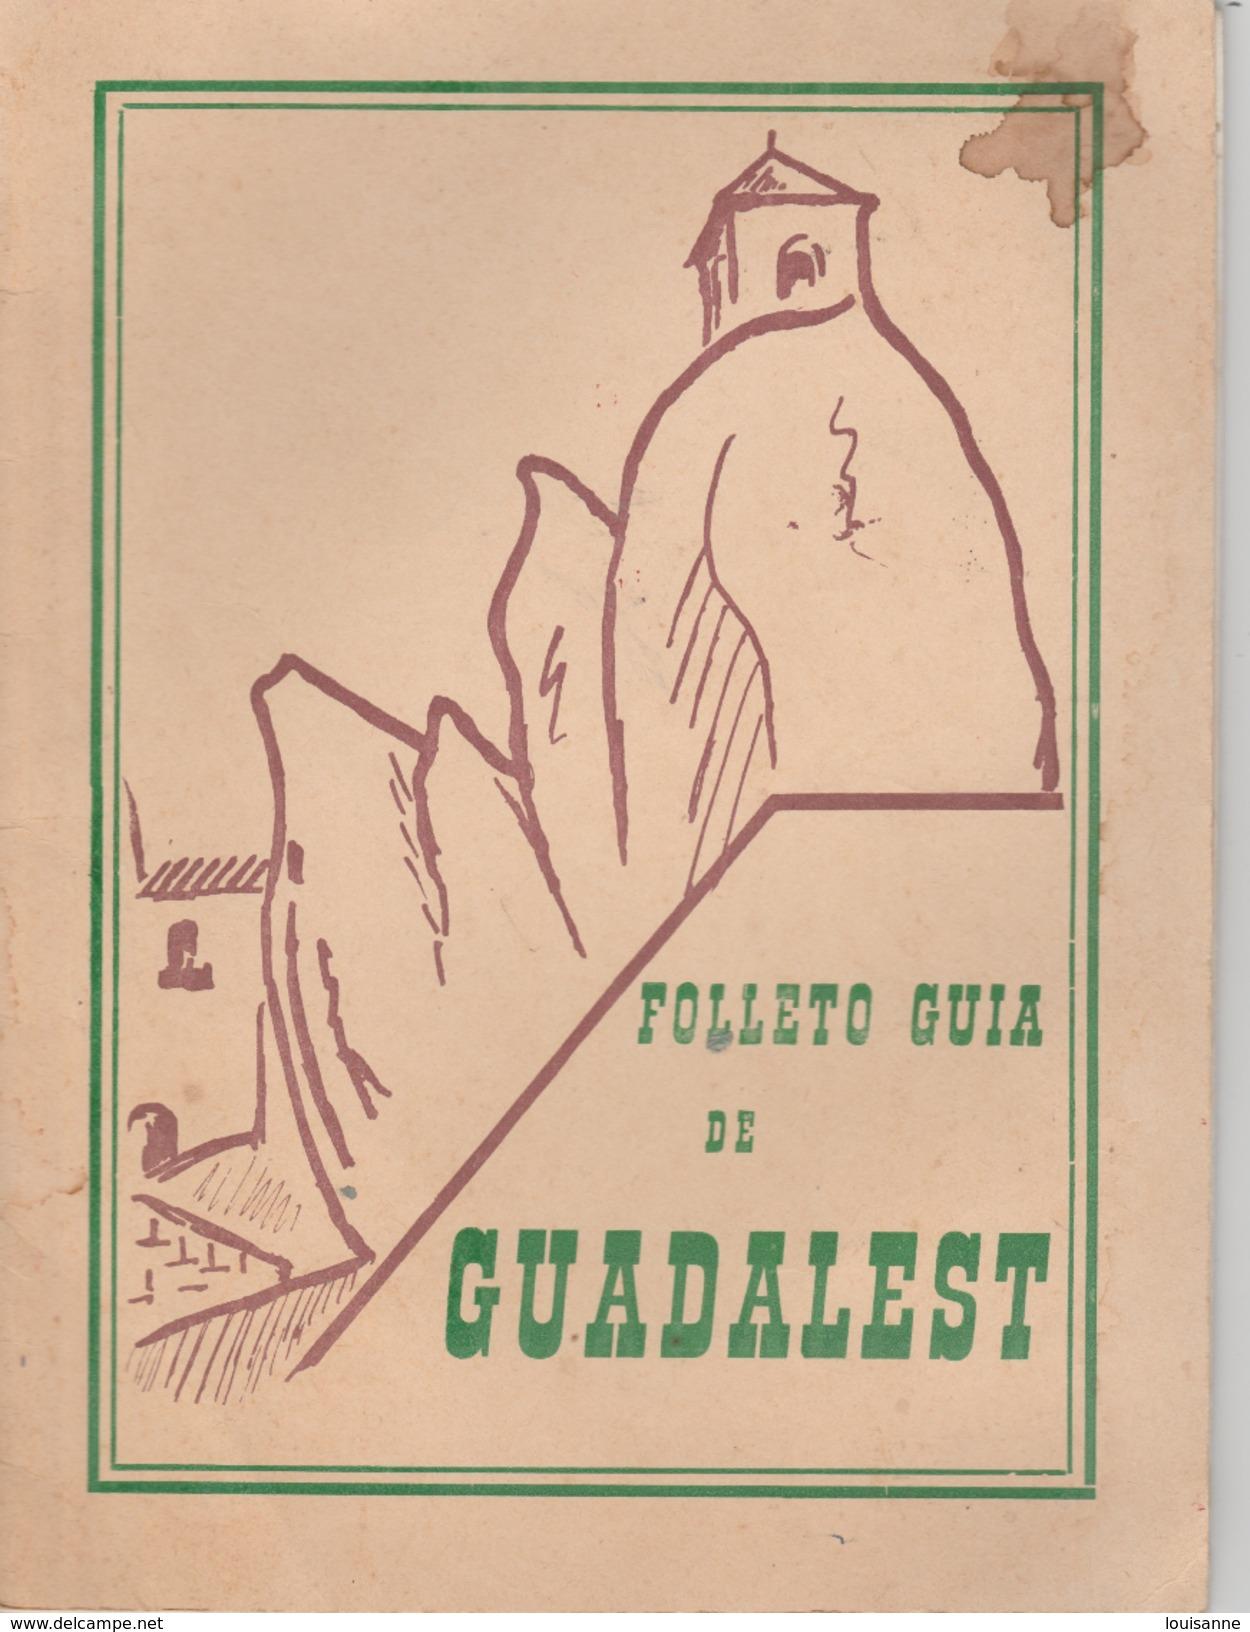 17  / 2 / 265  - FOLLETO  GUIA  DE  GUADALEST  ( EN LANGE ESPAGNOL ) - Culture